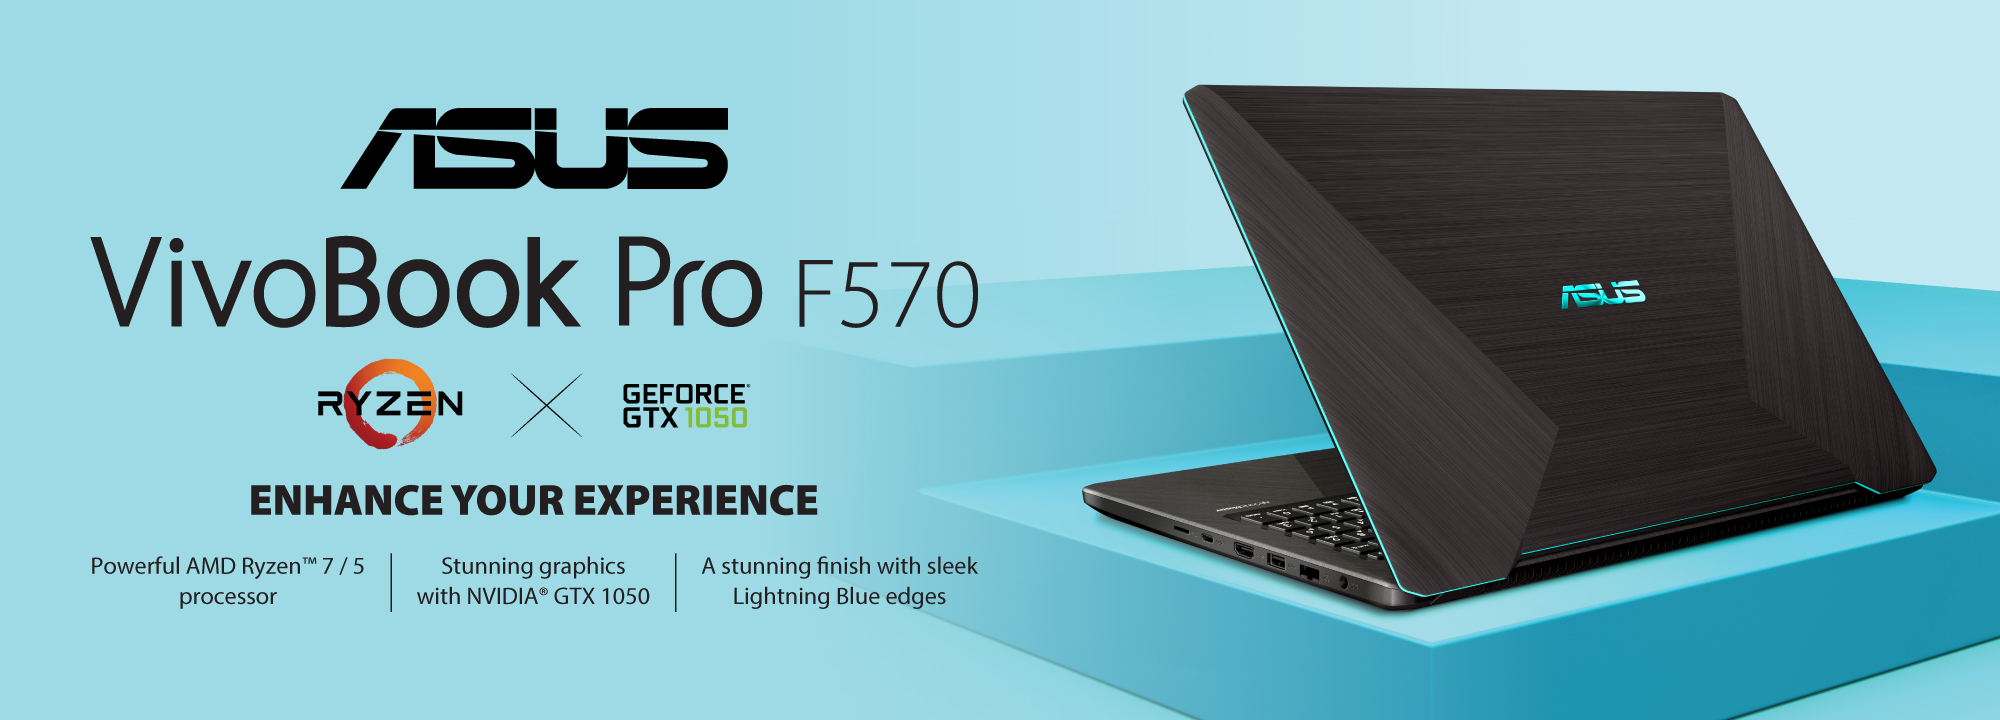 Berkenalan dengan Laptop Terbaru ASUS VivoBook Pro F570 1